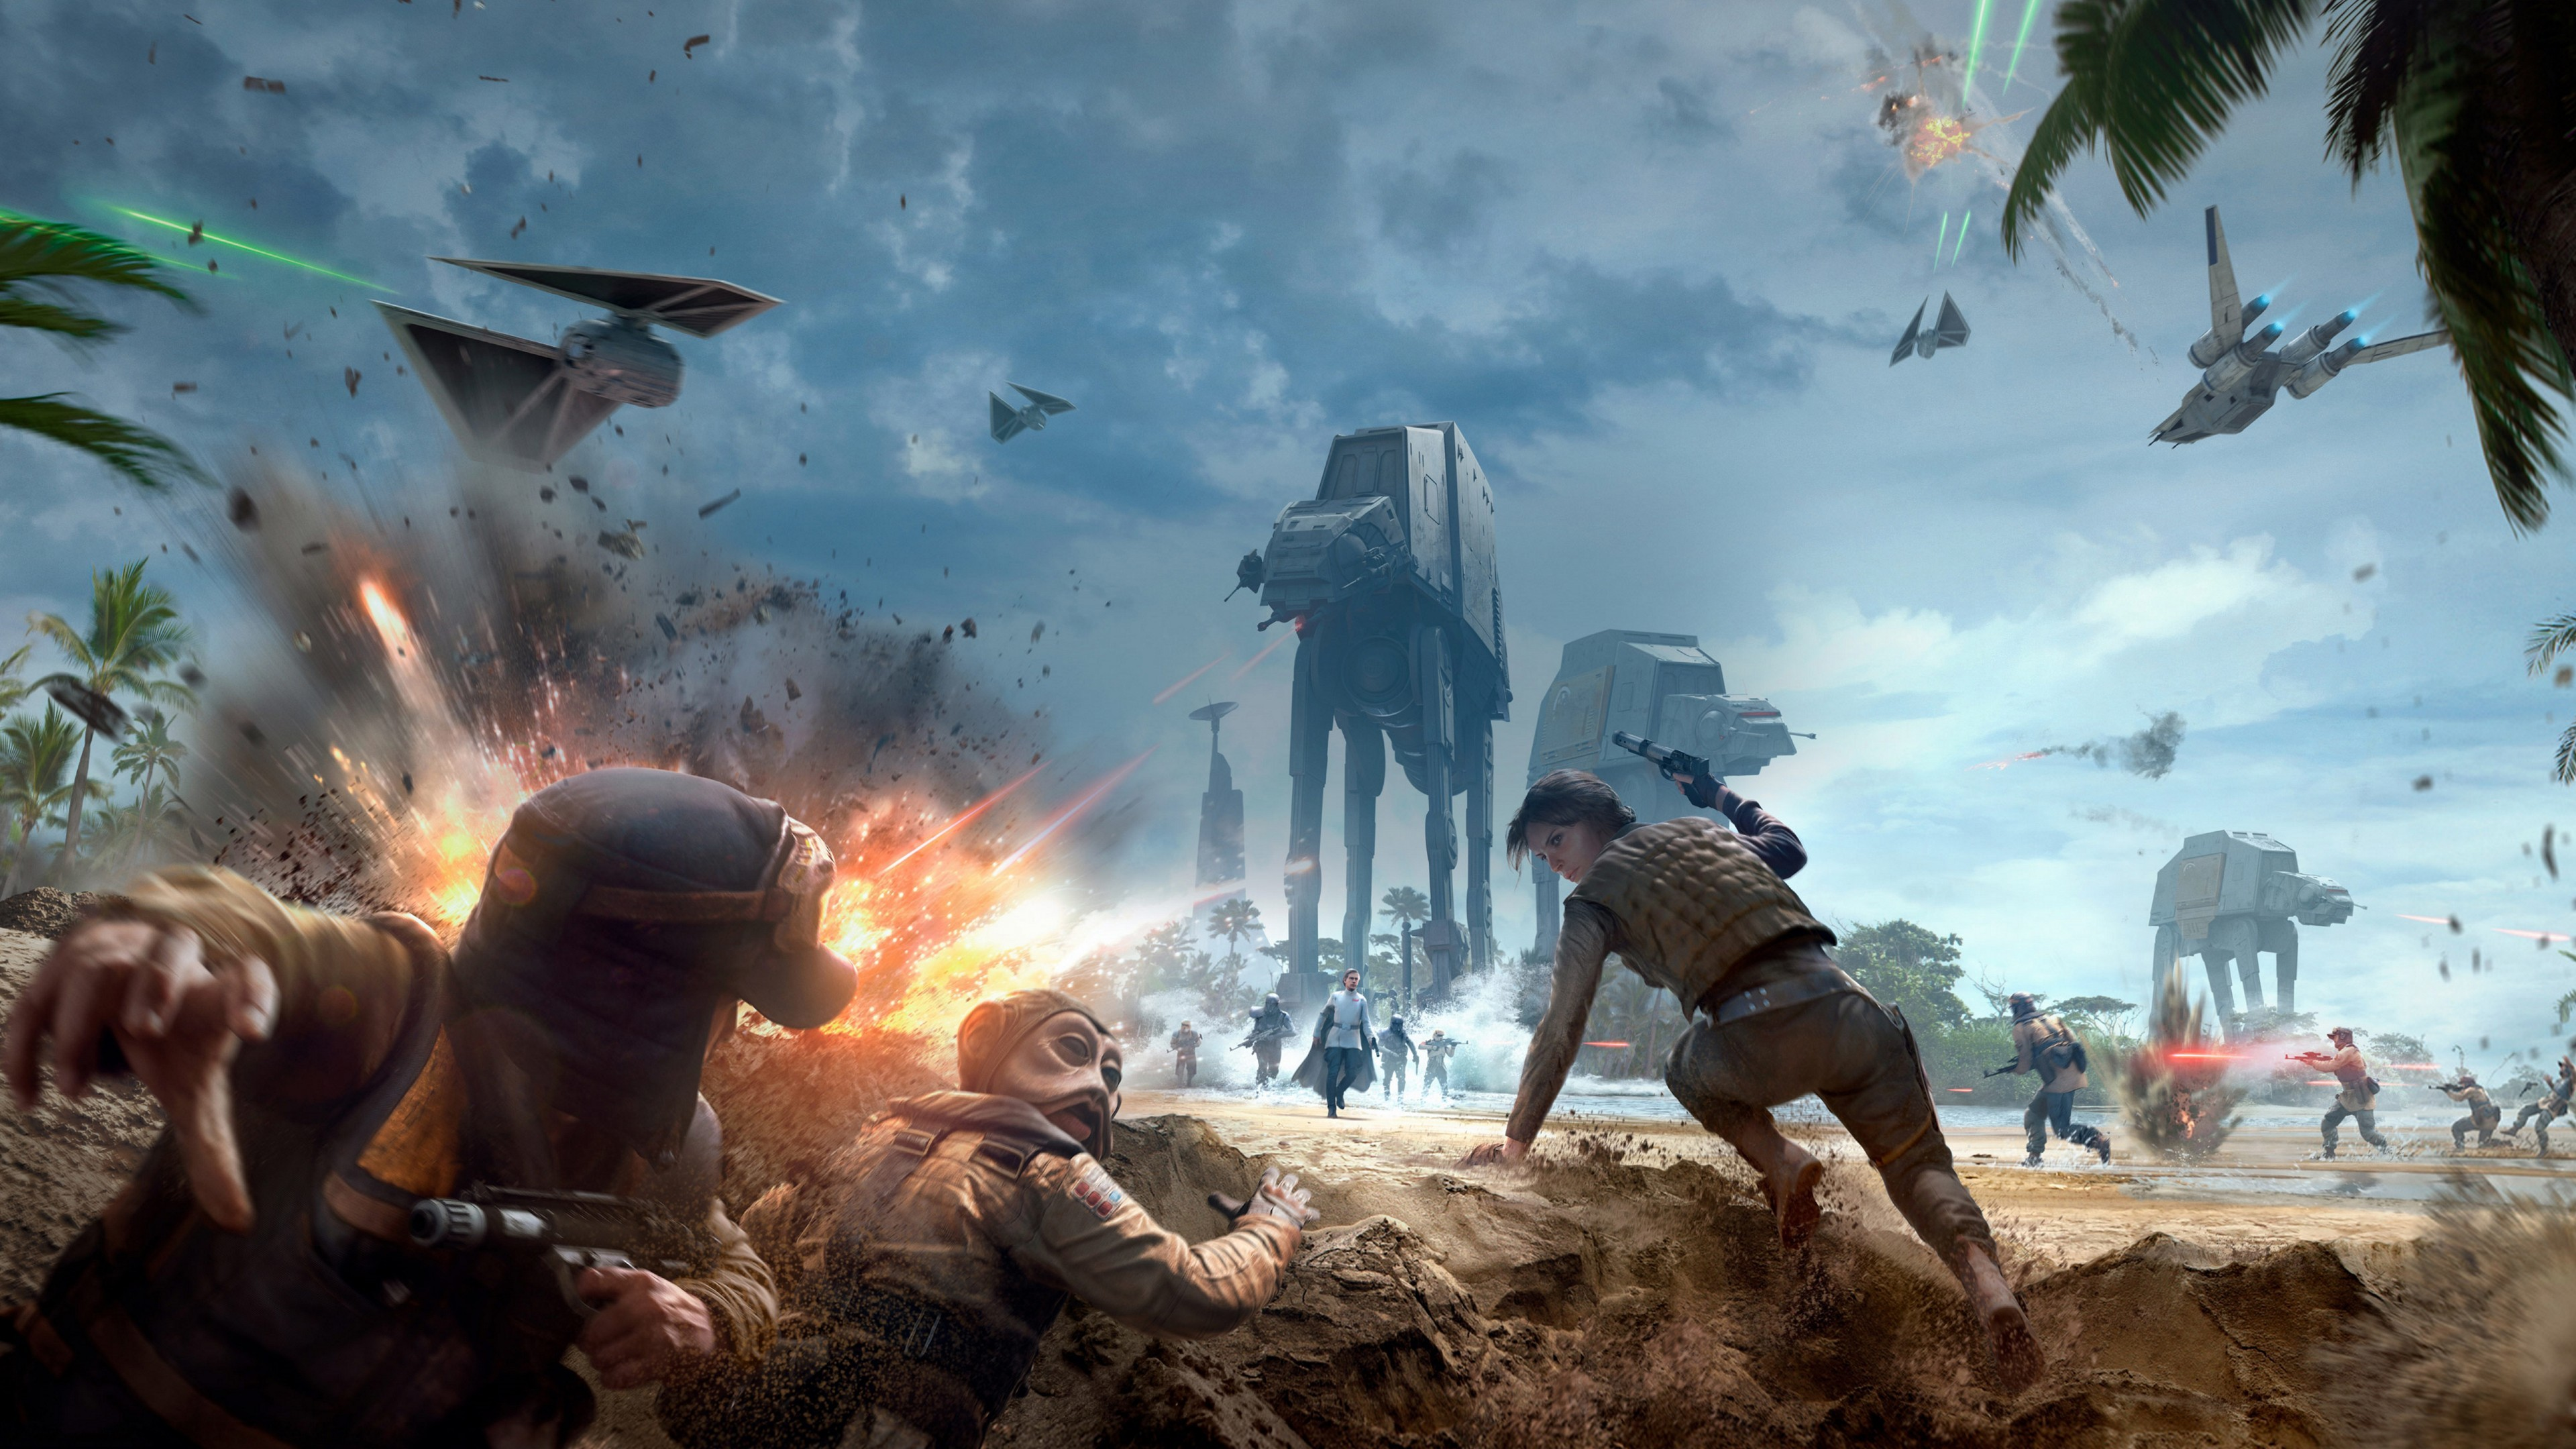 Rogue One Scarif Star Wars Battlefront Wallpaper